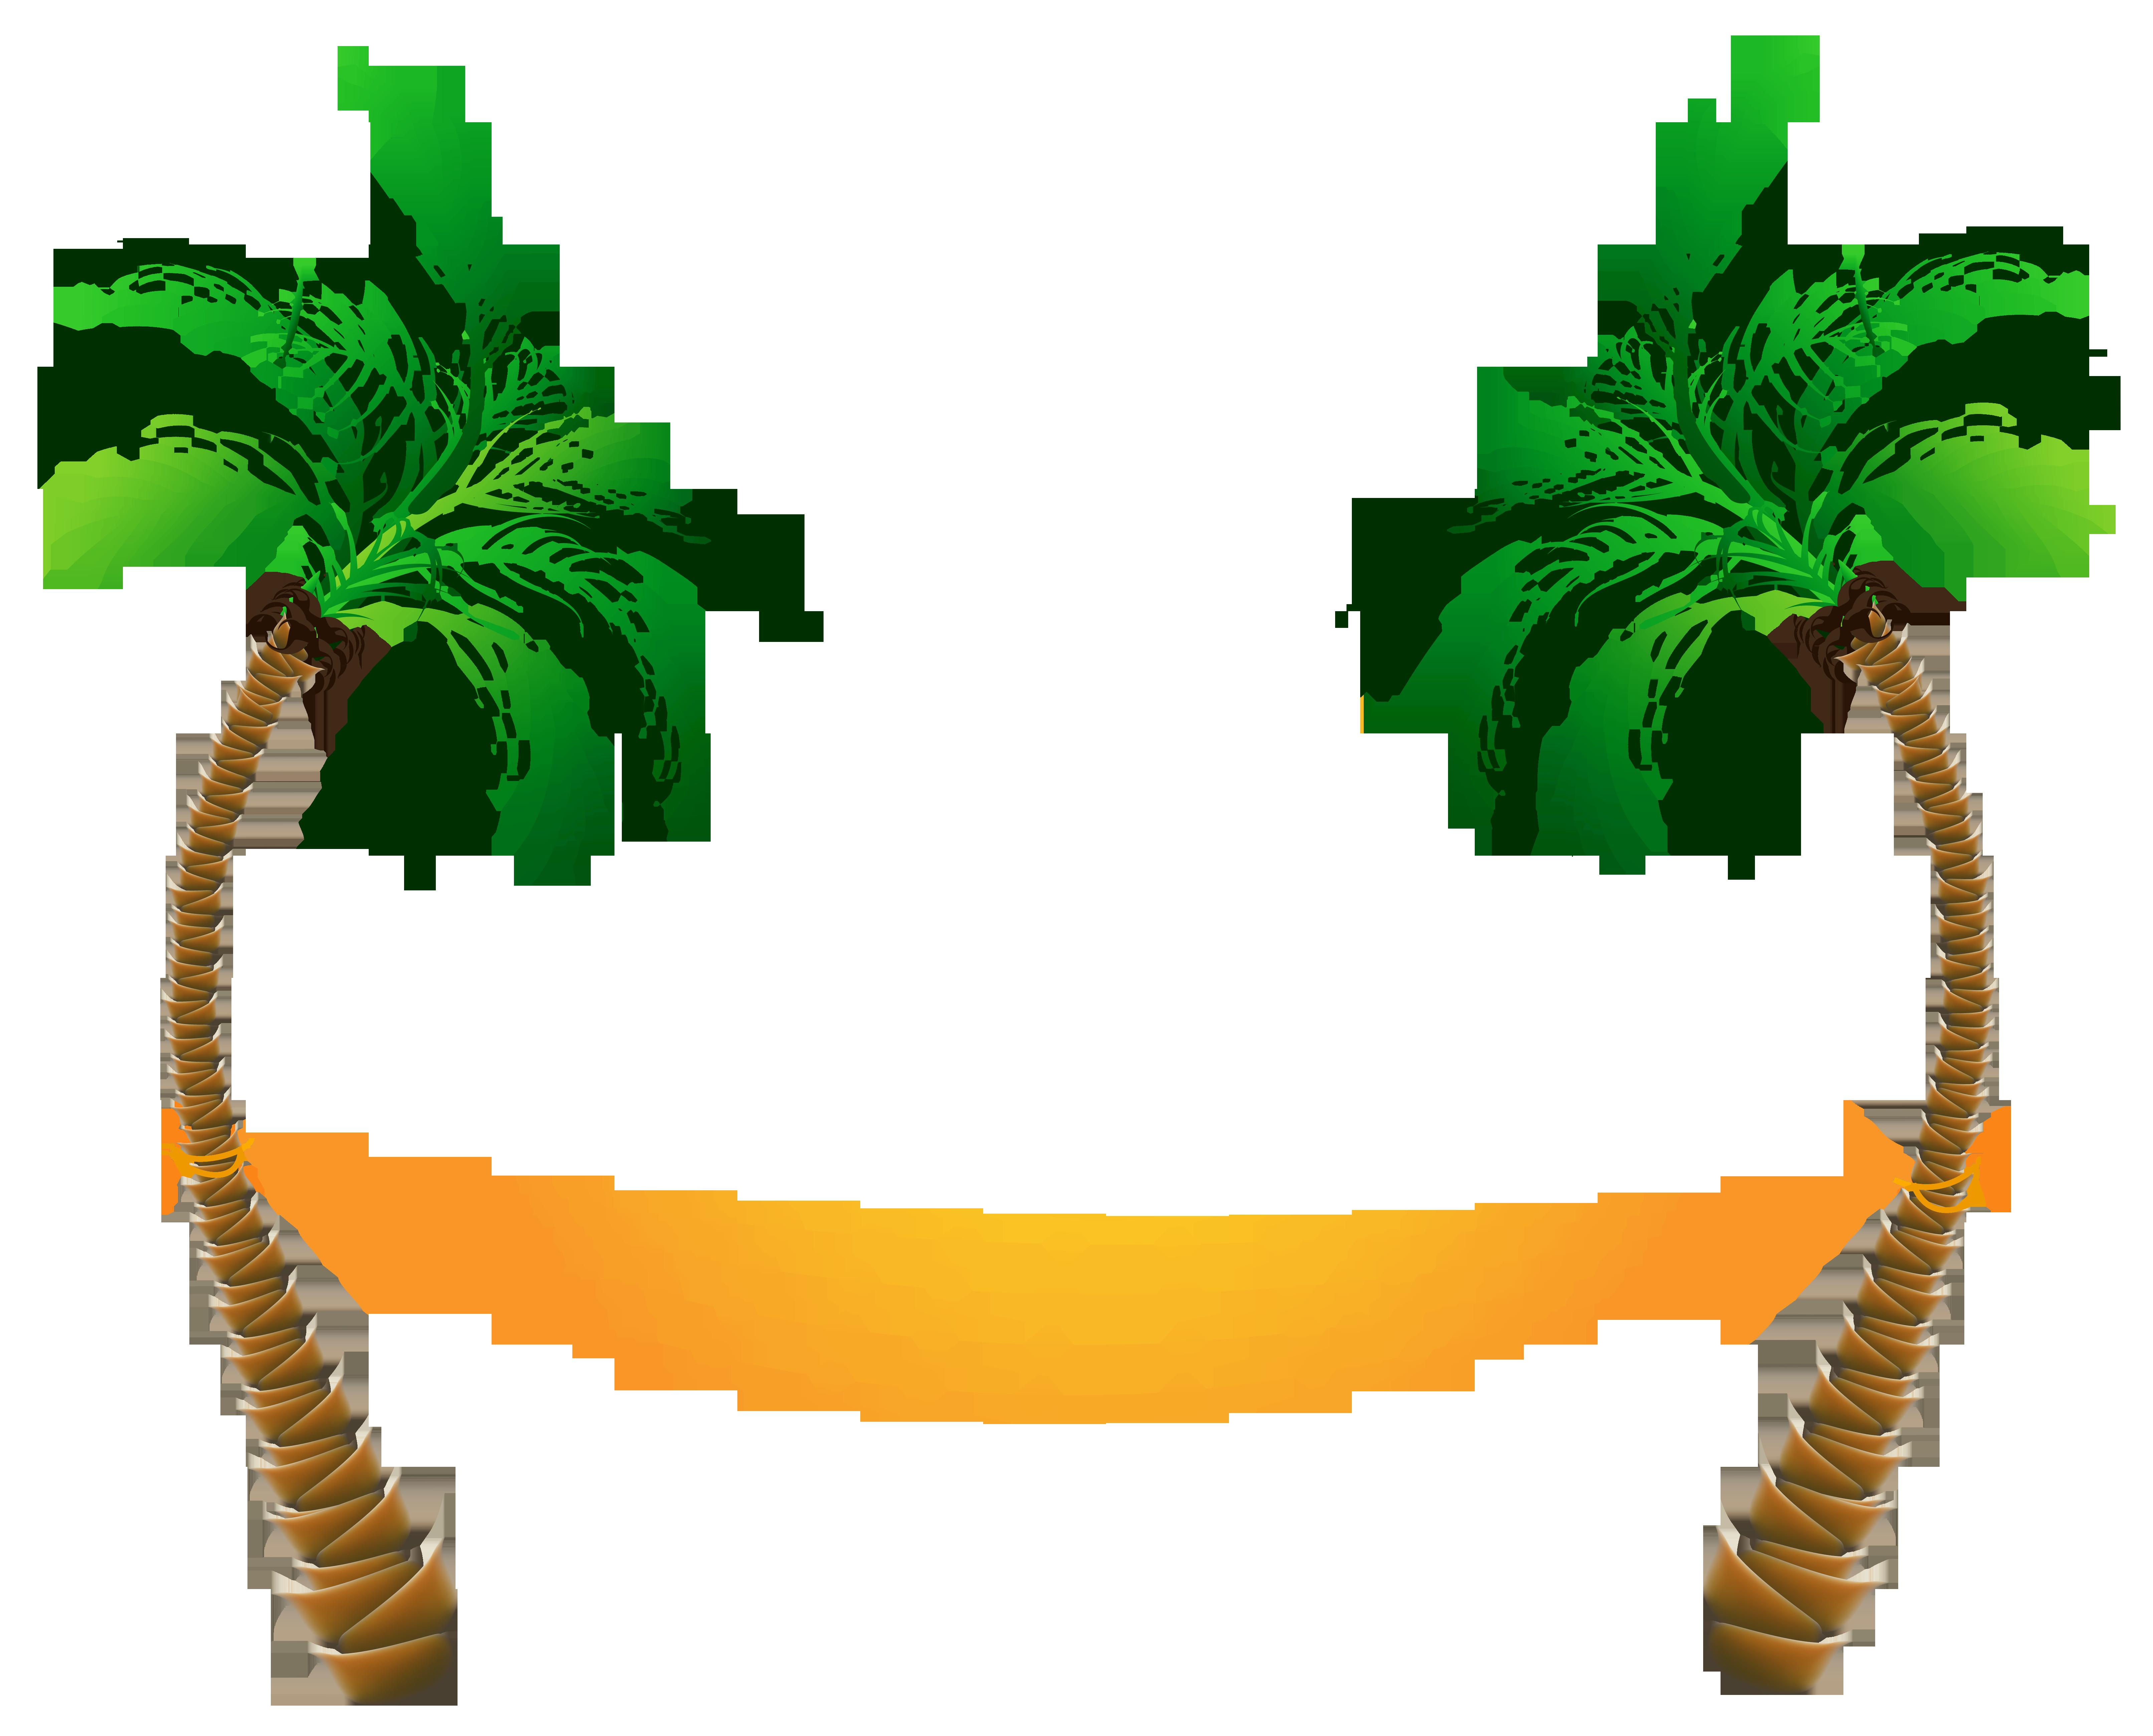 Clipart hammok graphic black and white Free Hammock Cliparts, Download Free Clip Art, Free Clip Art on ... graphic black and white